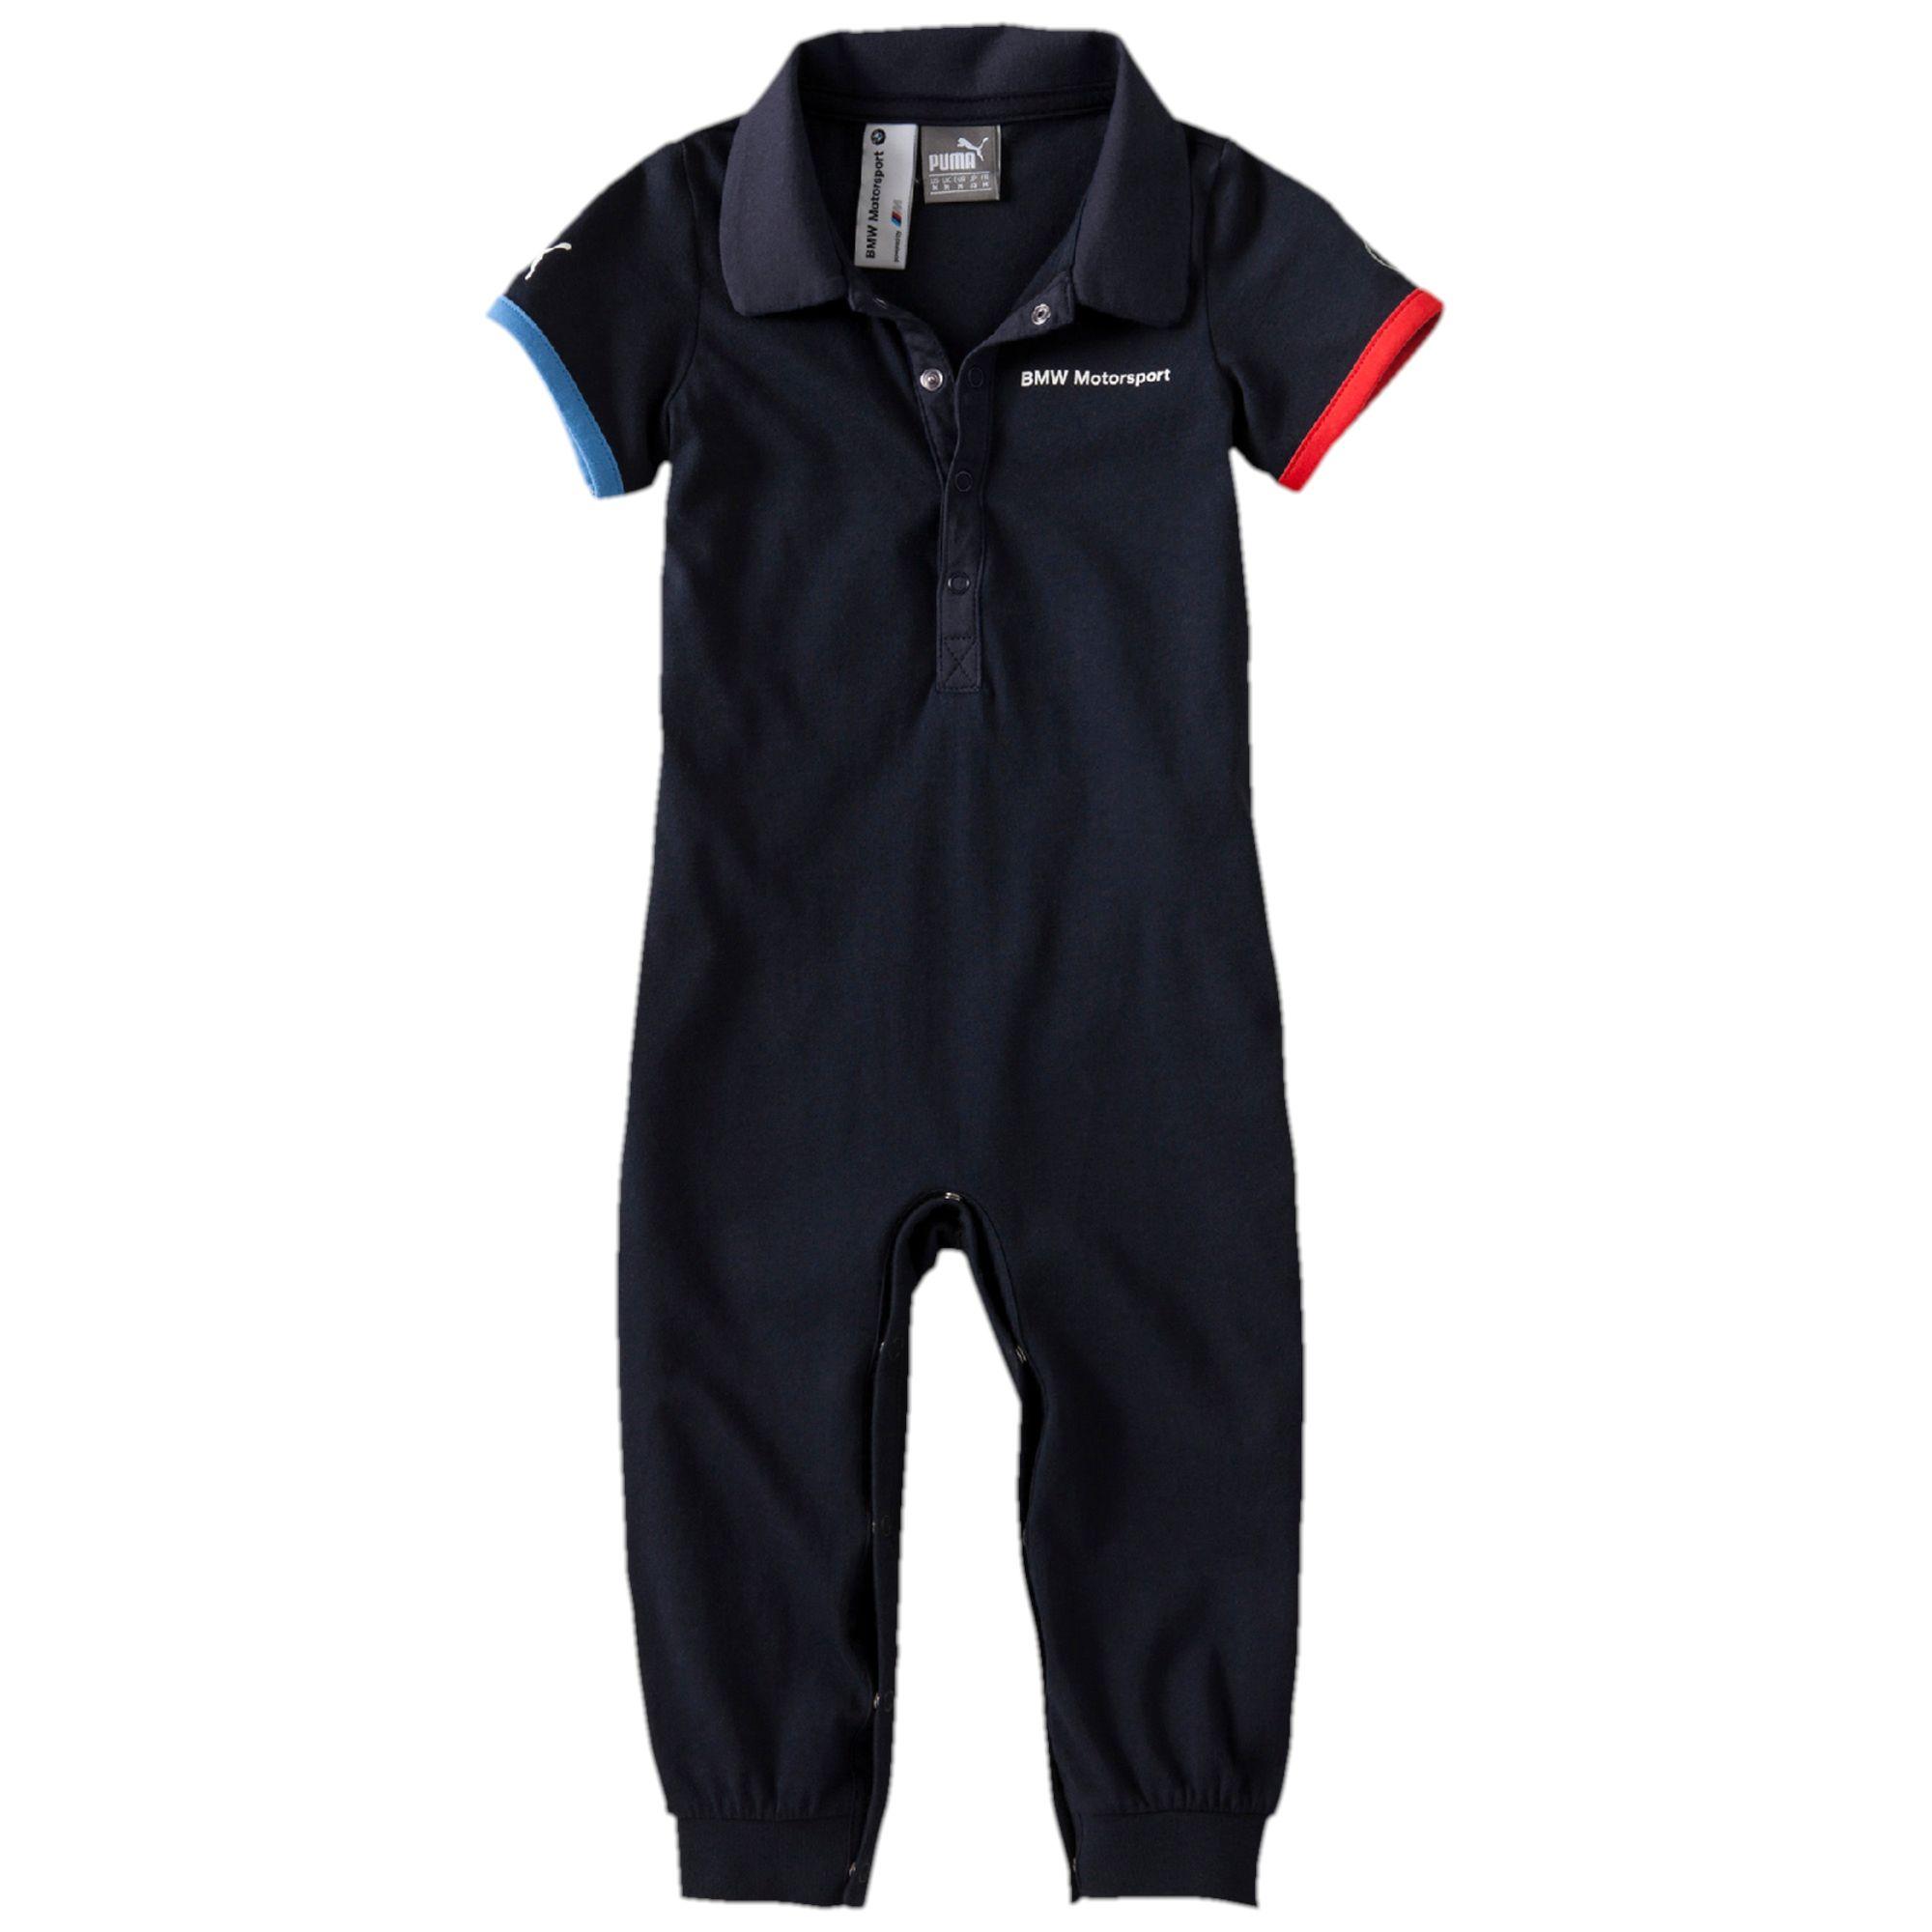 puma bmw motorsport jumpsuit bekleidung automotive unisex. Black Bedroom Furniture Sets. Home Design Ideas